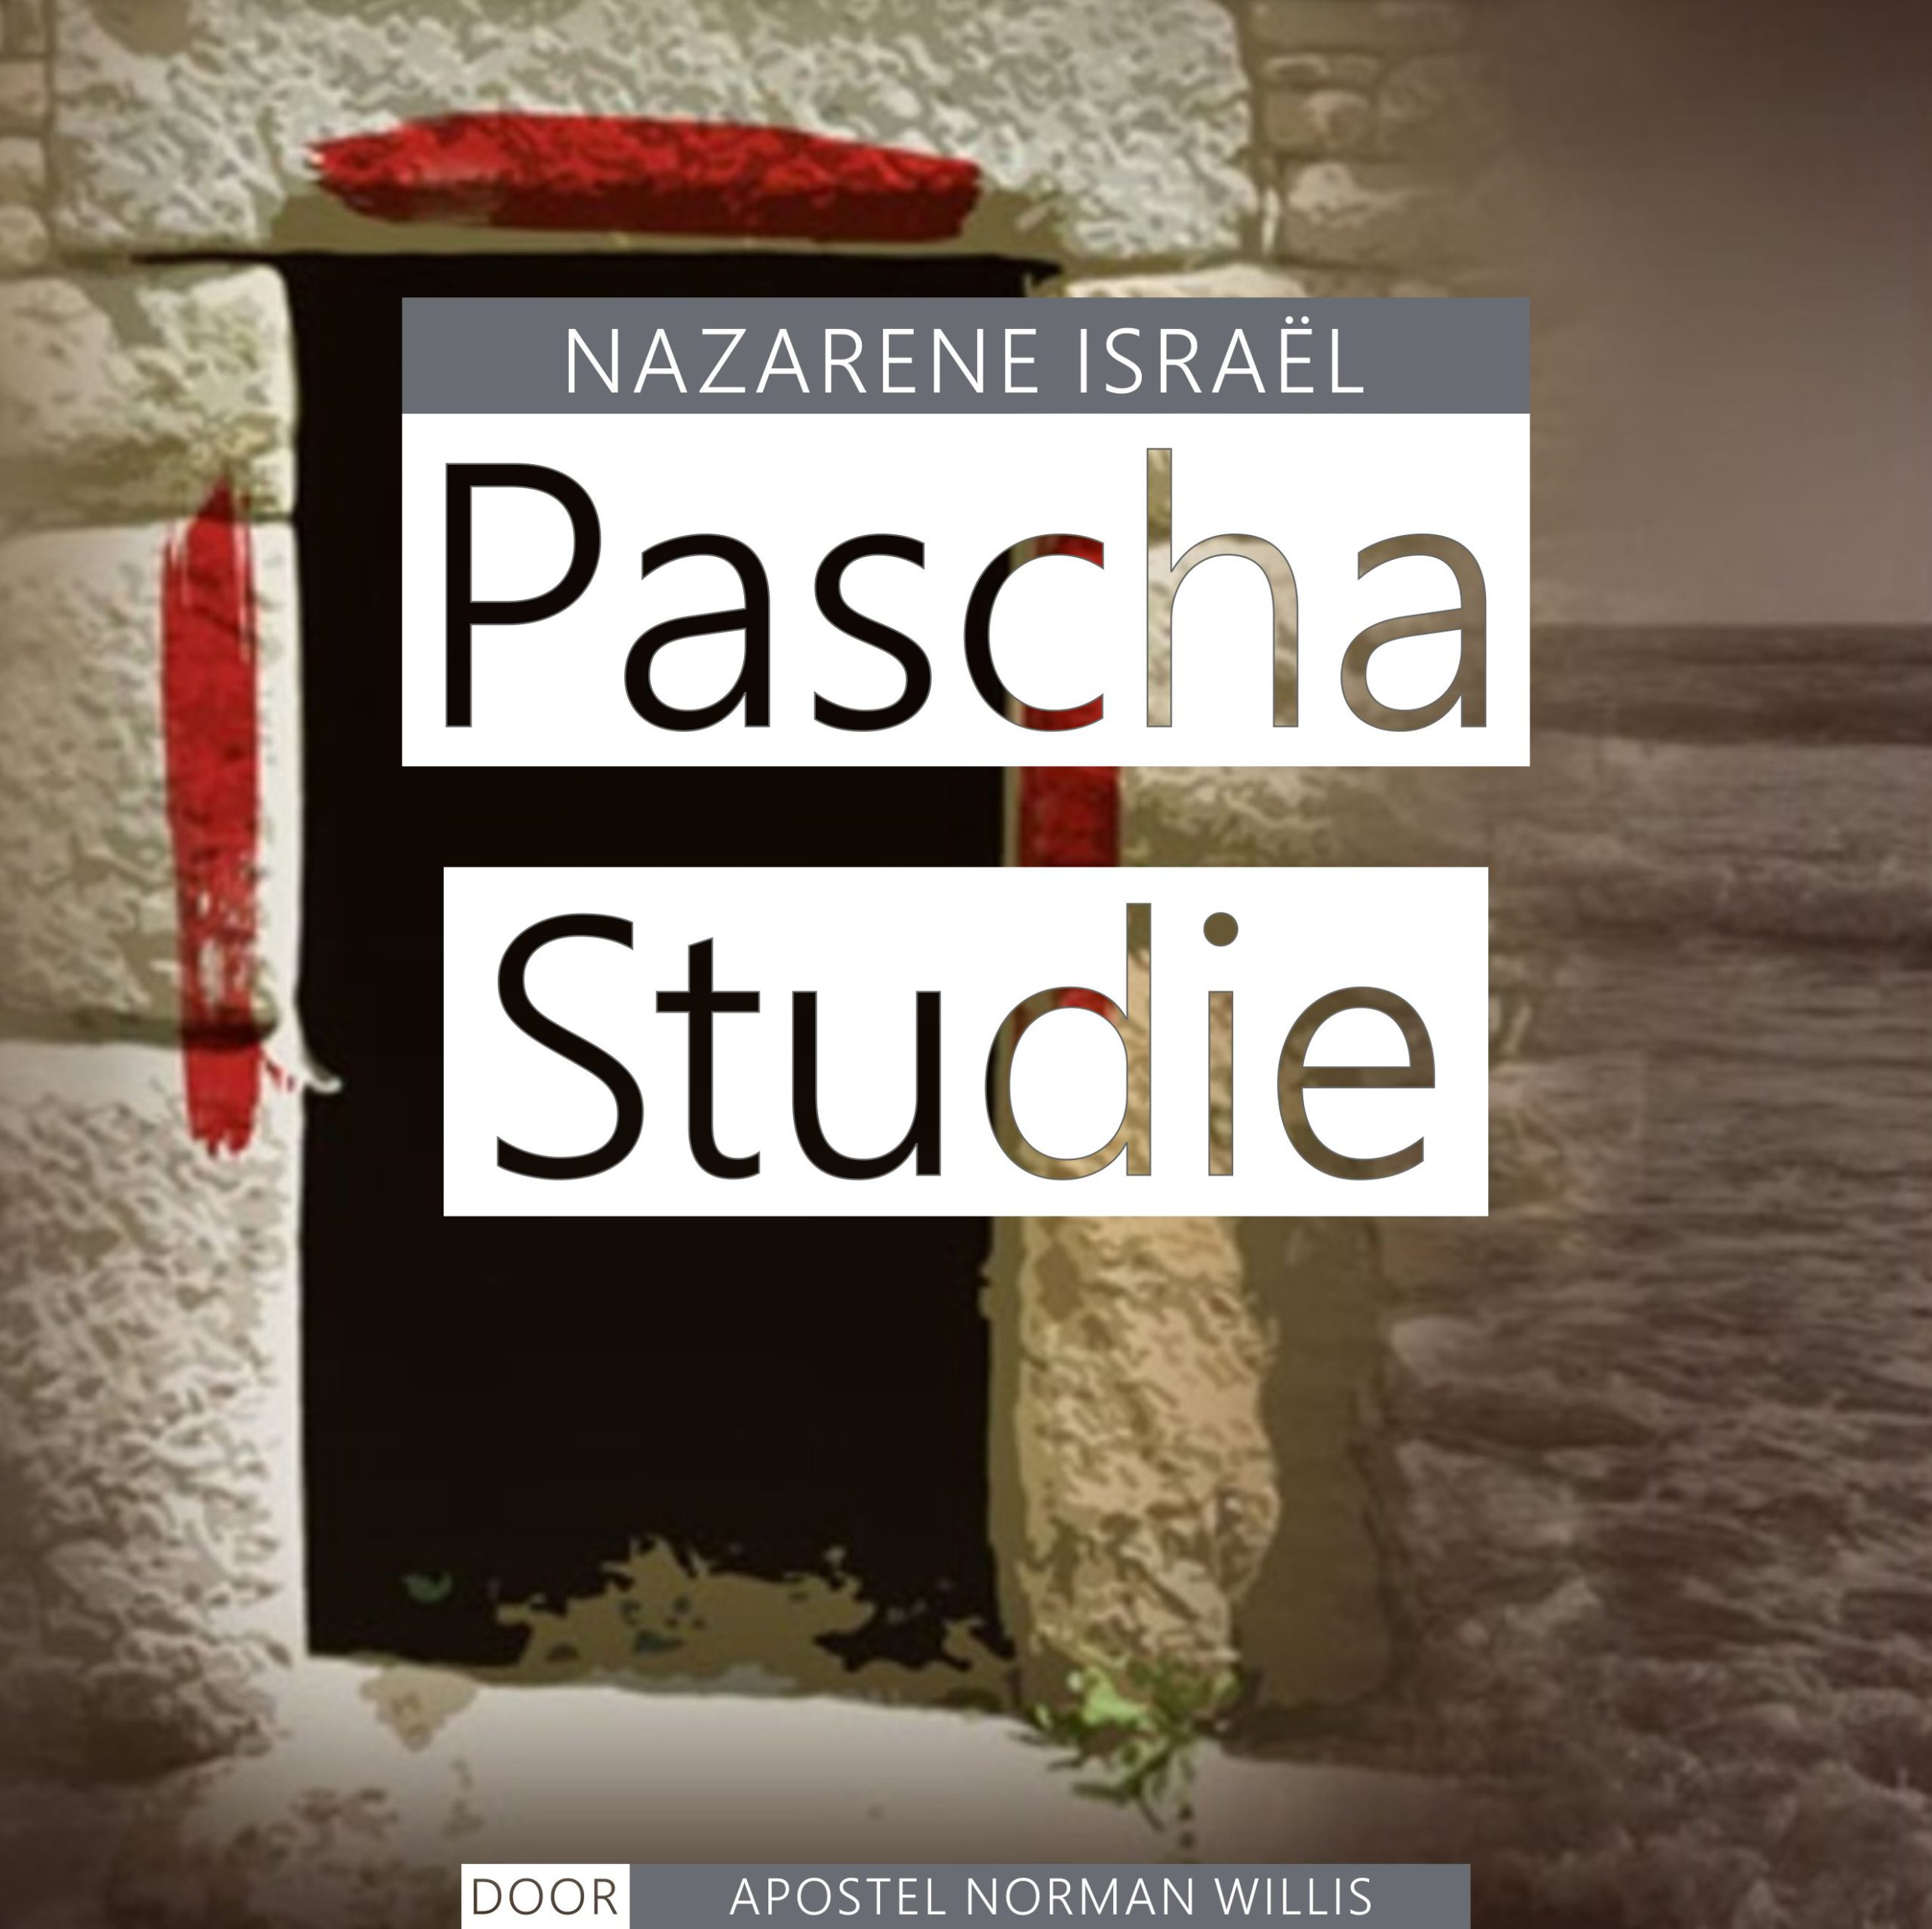 Nazarene Israël Pascha Studie